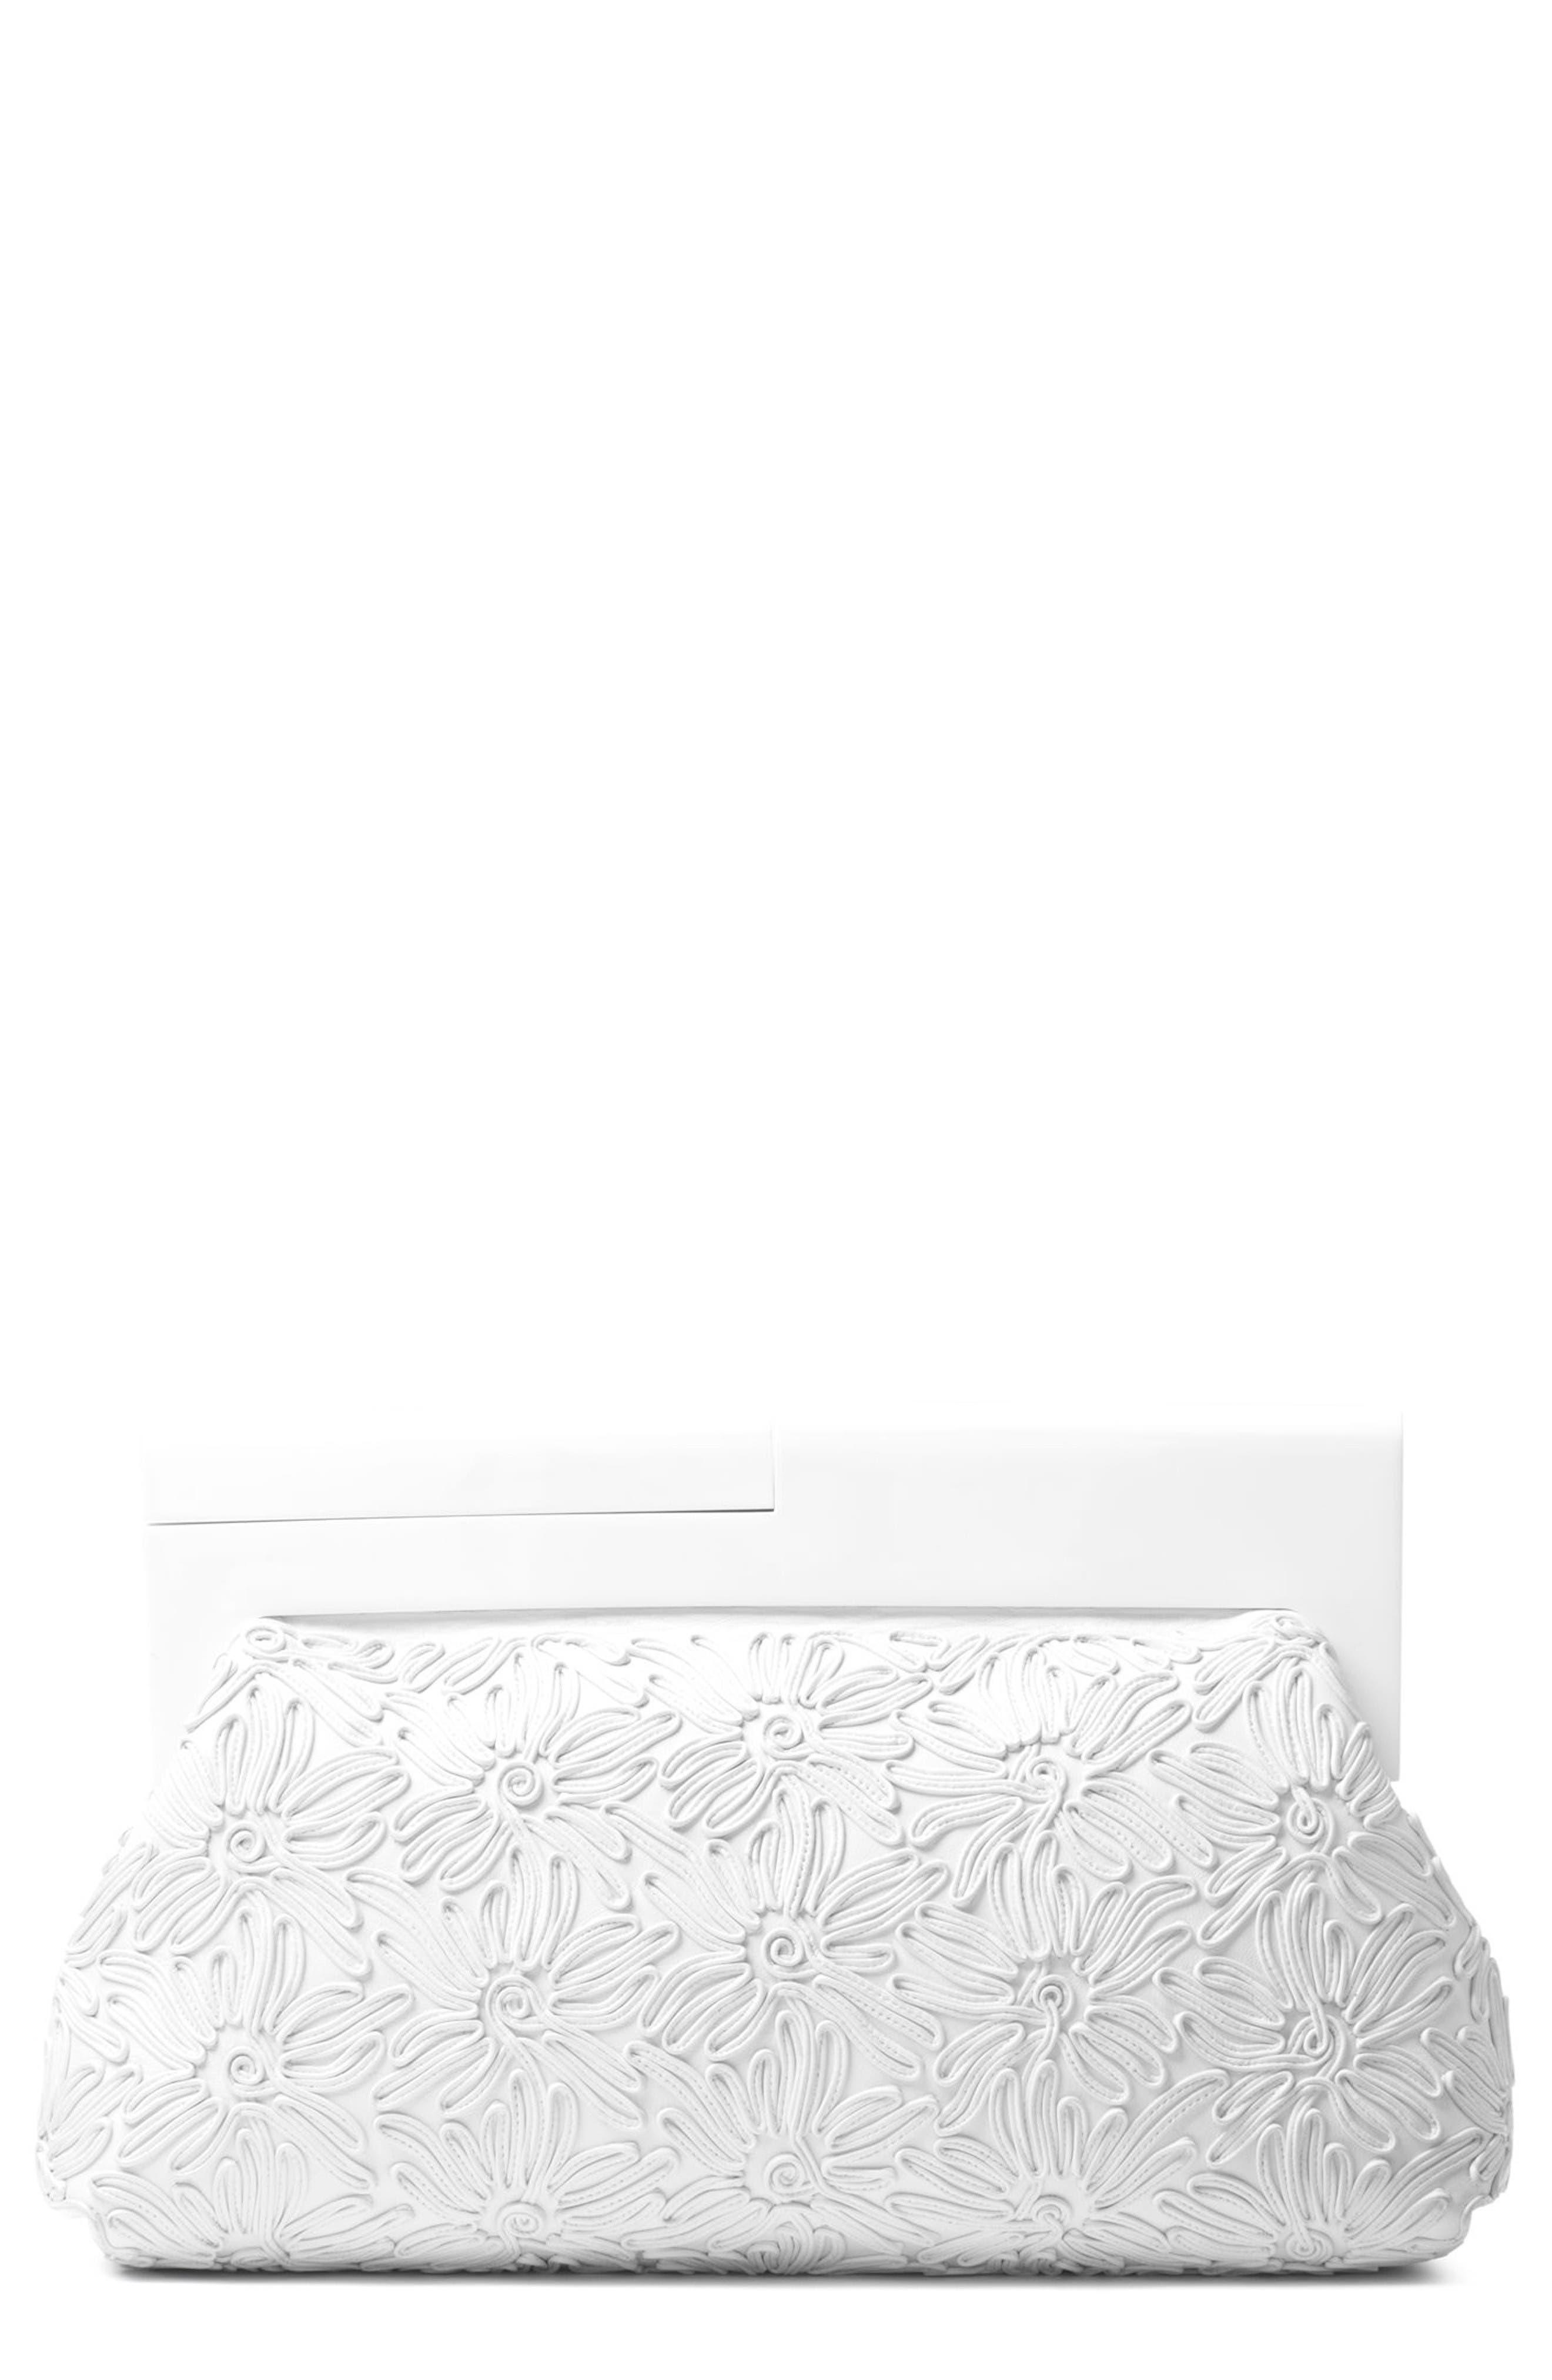 Main Image - Michael Kors Stanwyck Calfskin Leather Frame Clutch